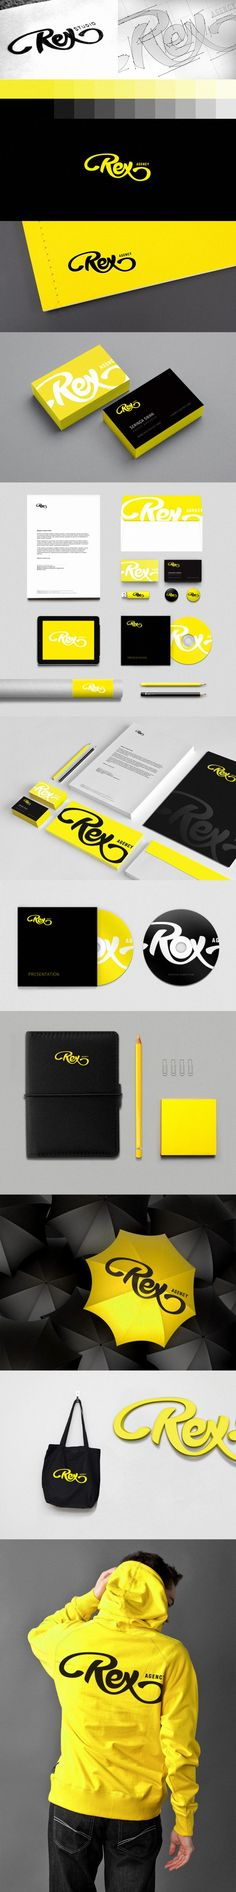 #inspiration #print #branding